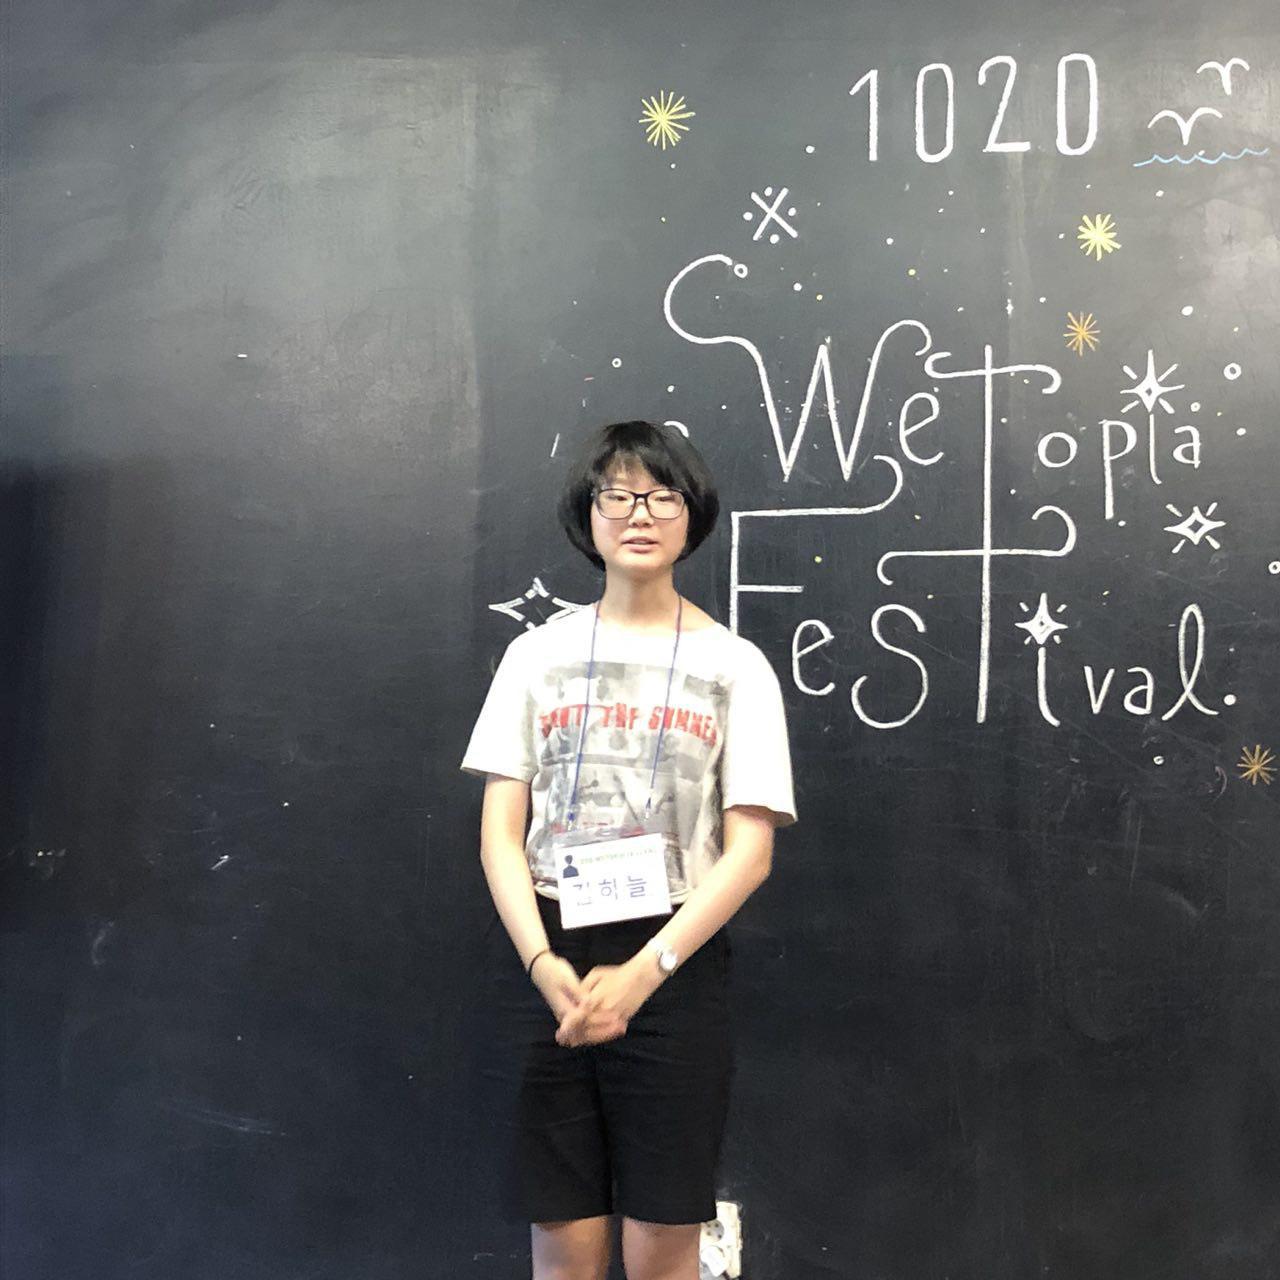 photo_2018-10-05_14-09-17.jpg